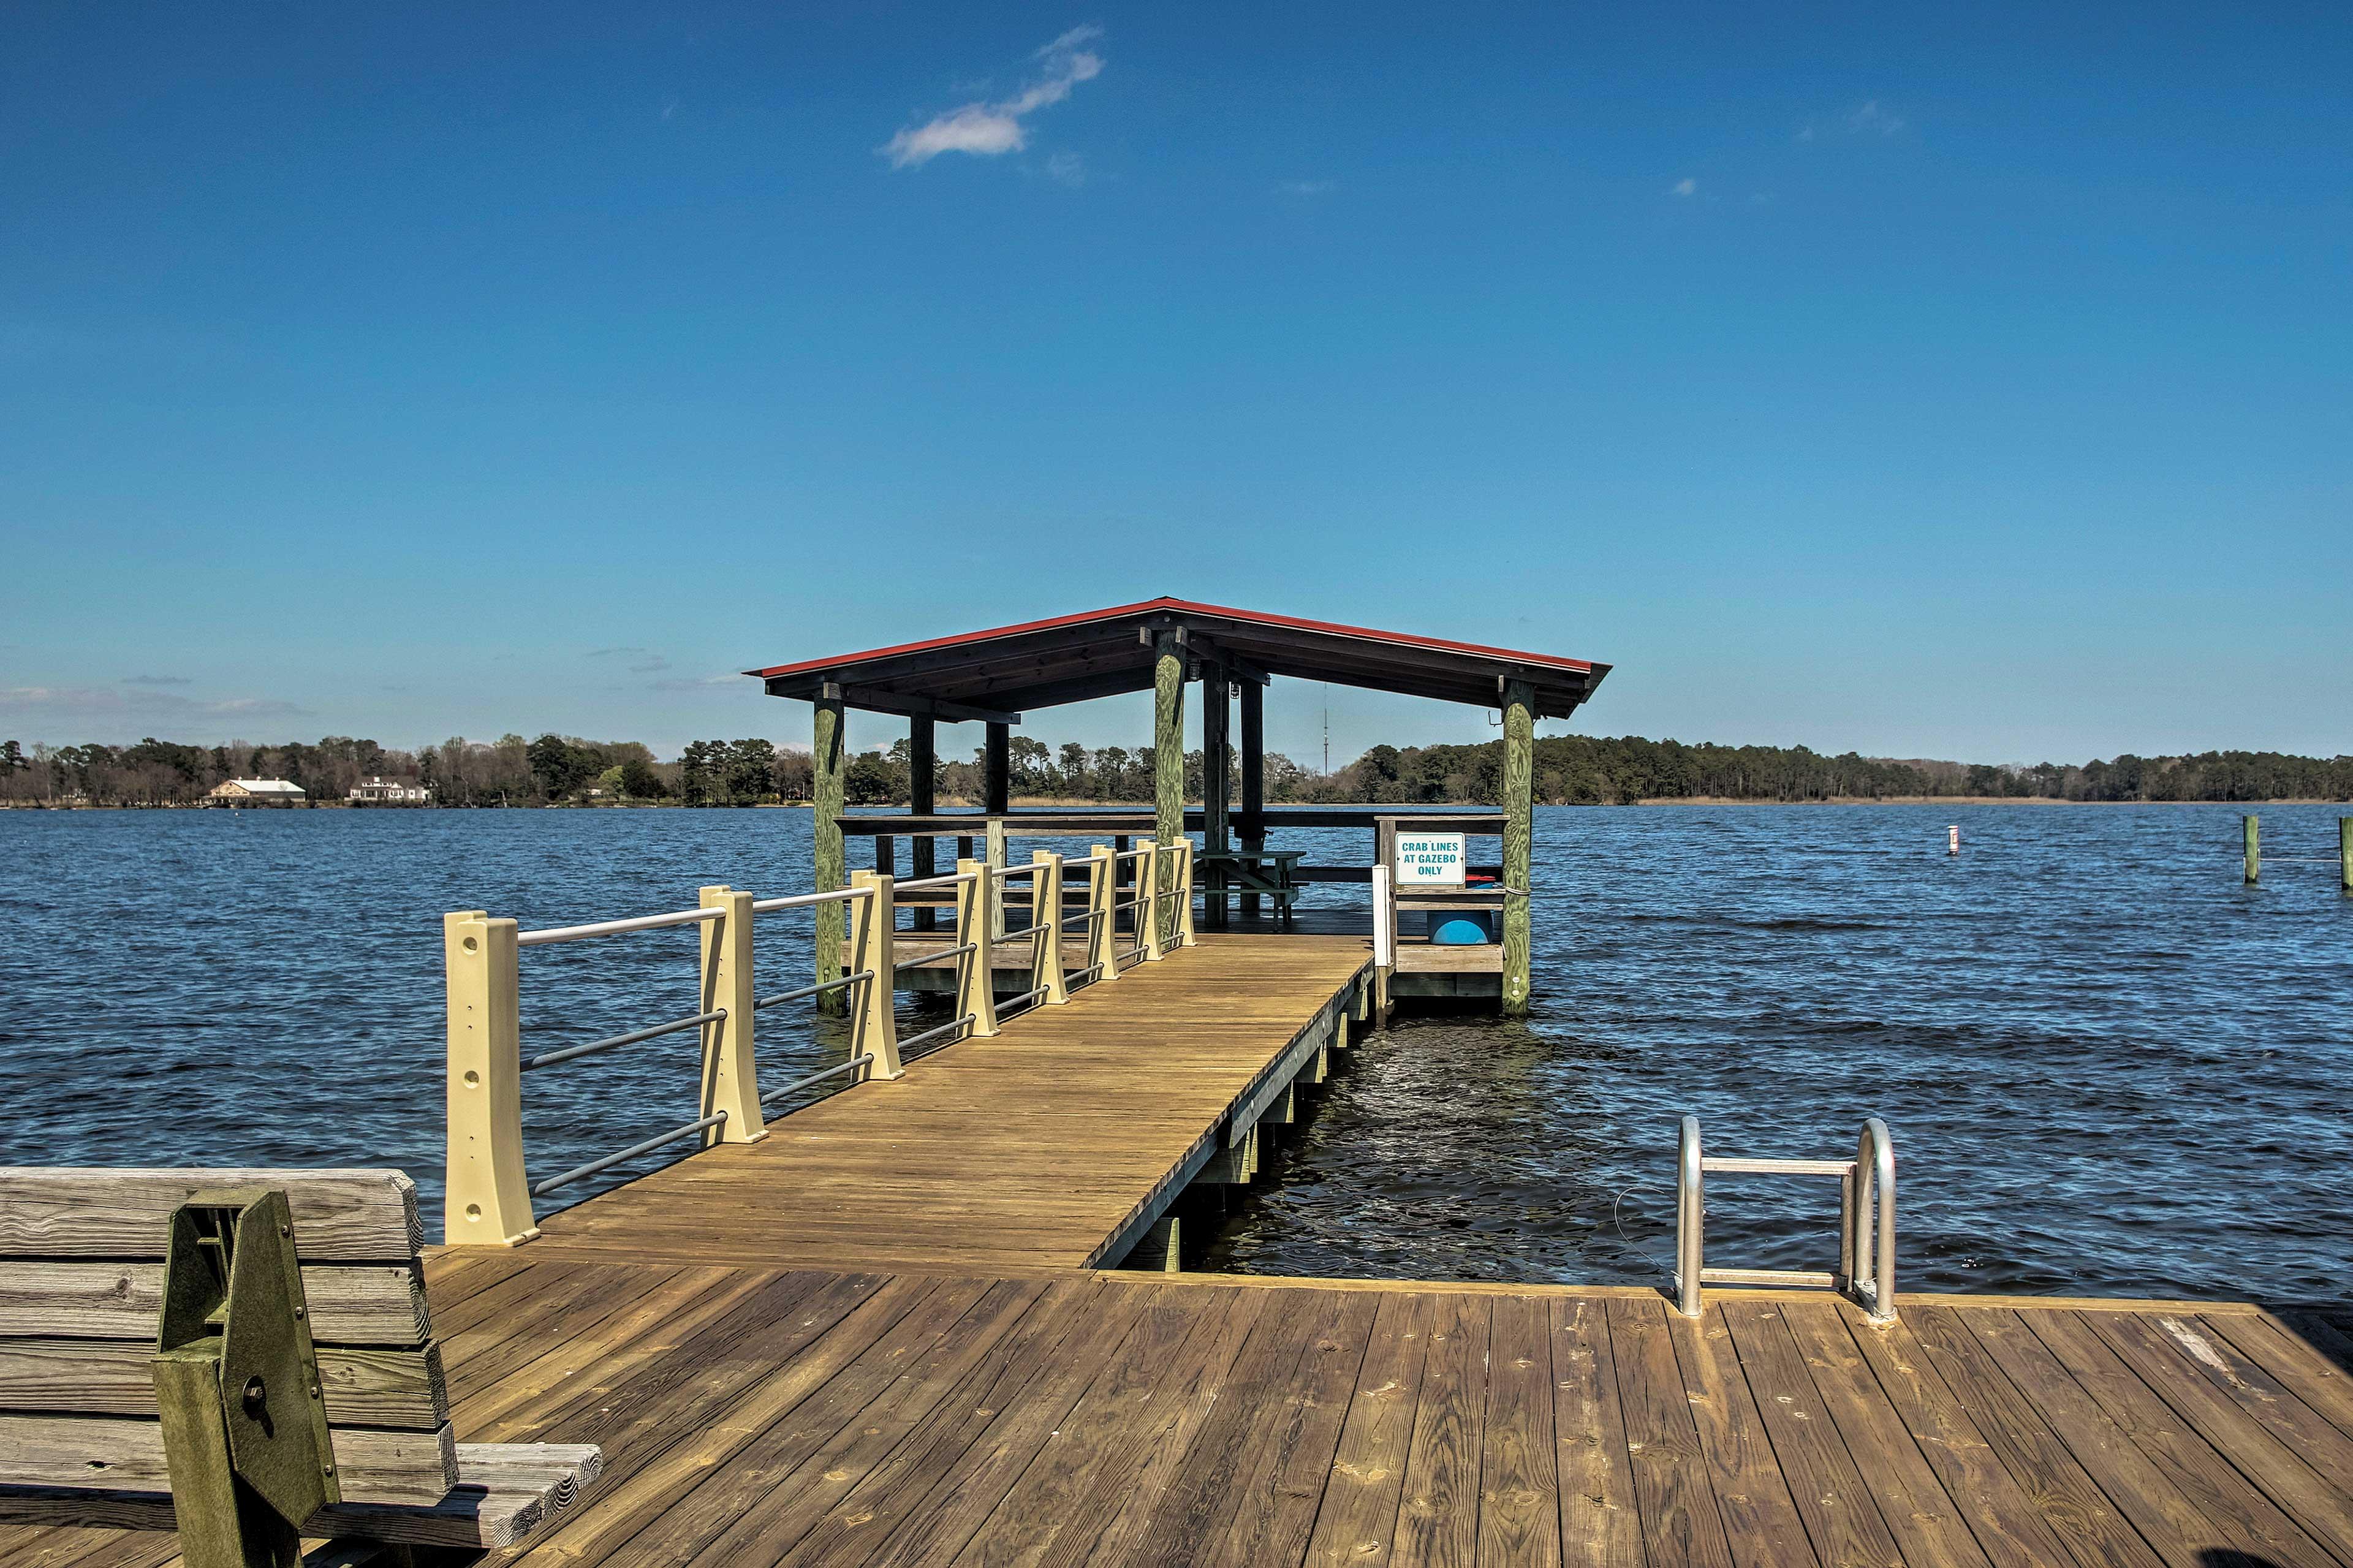 Enjoy a community pool, marina, picnic pavilion, playground & more!